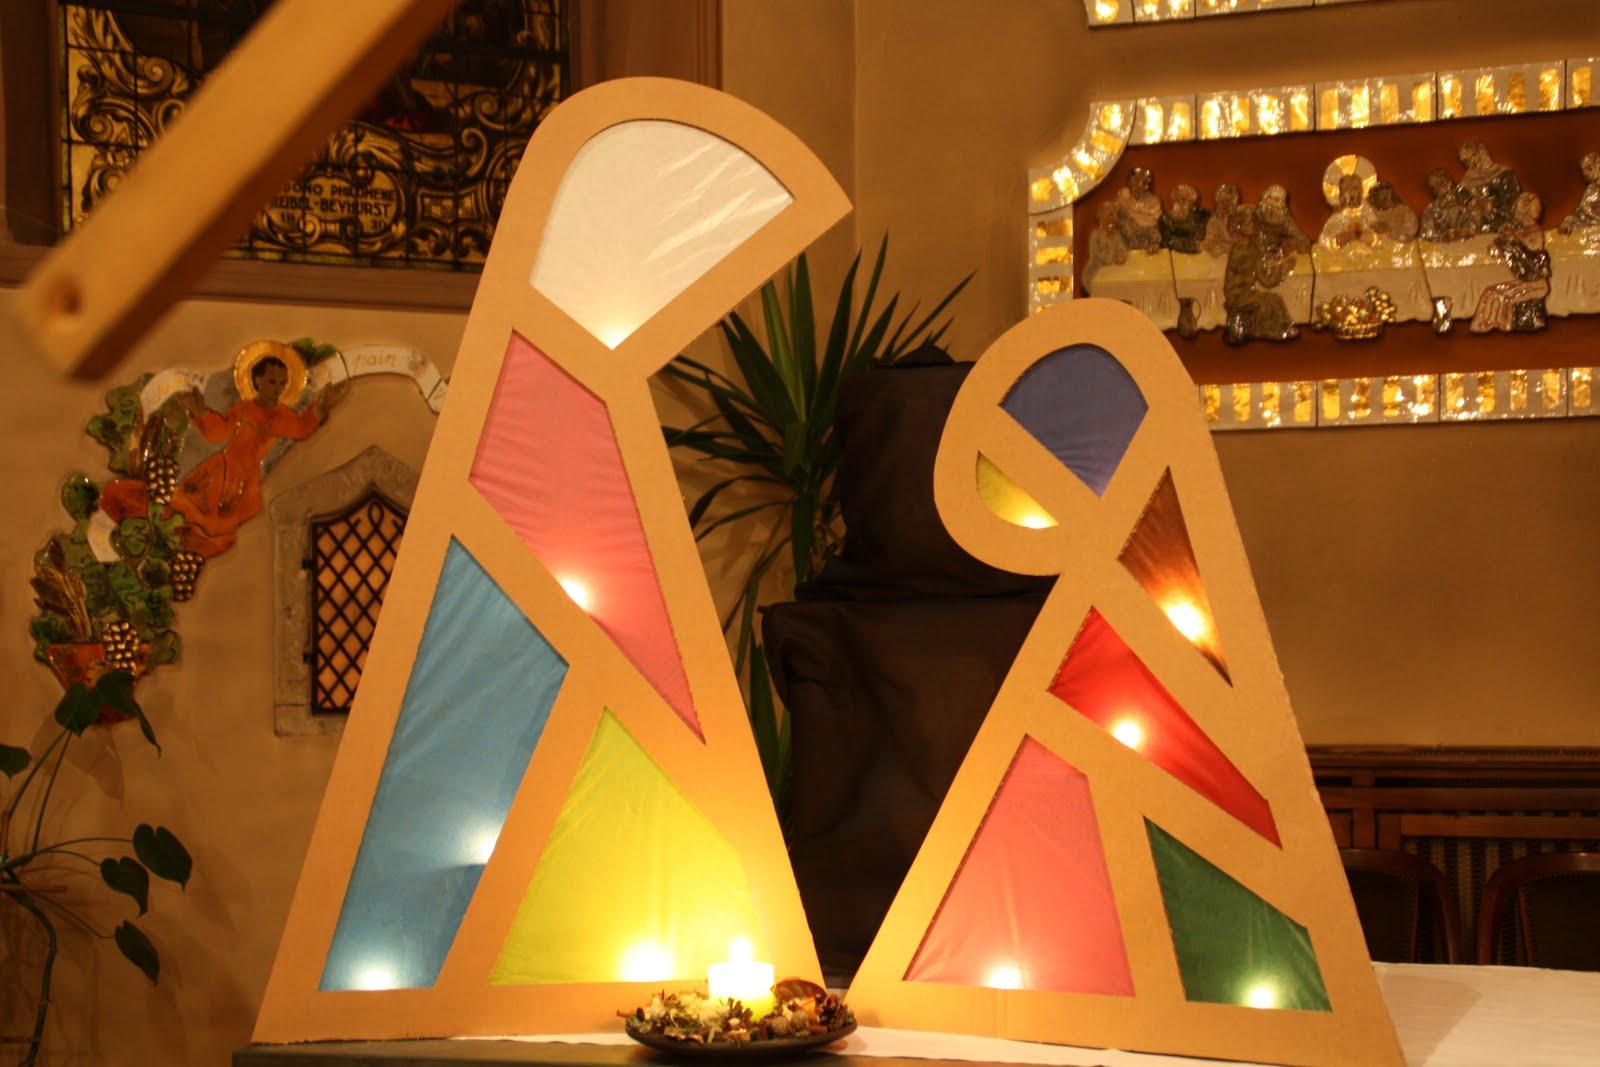 Decoration De Noel En Cafette D Expresso